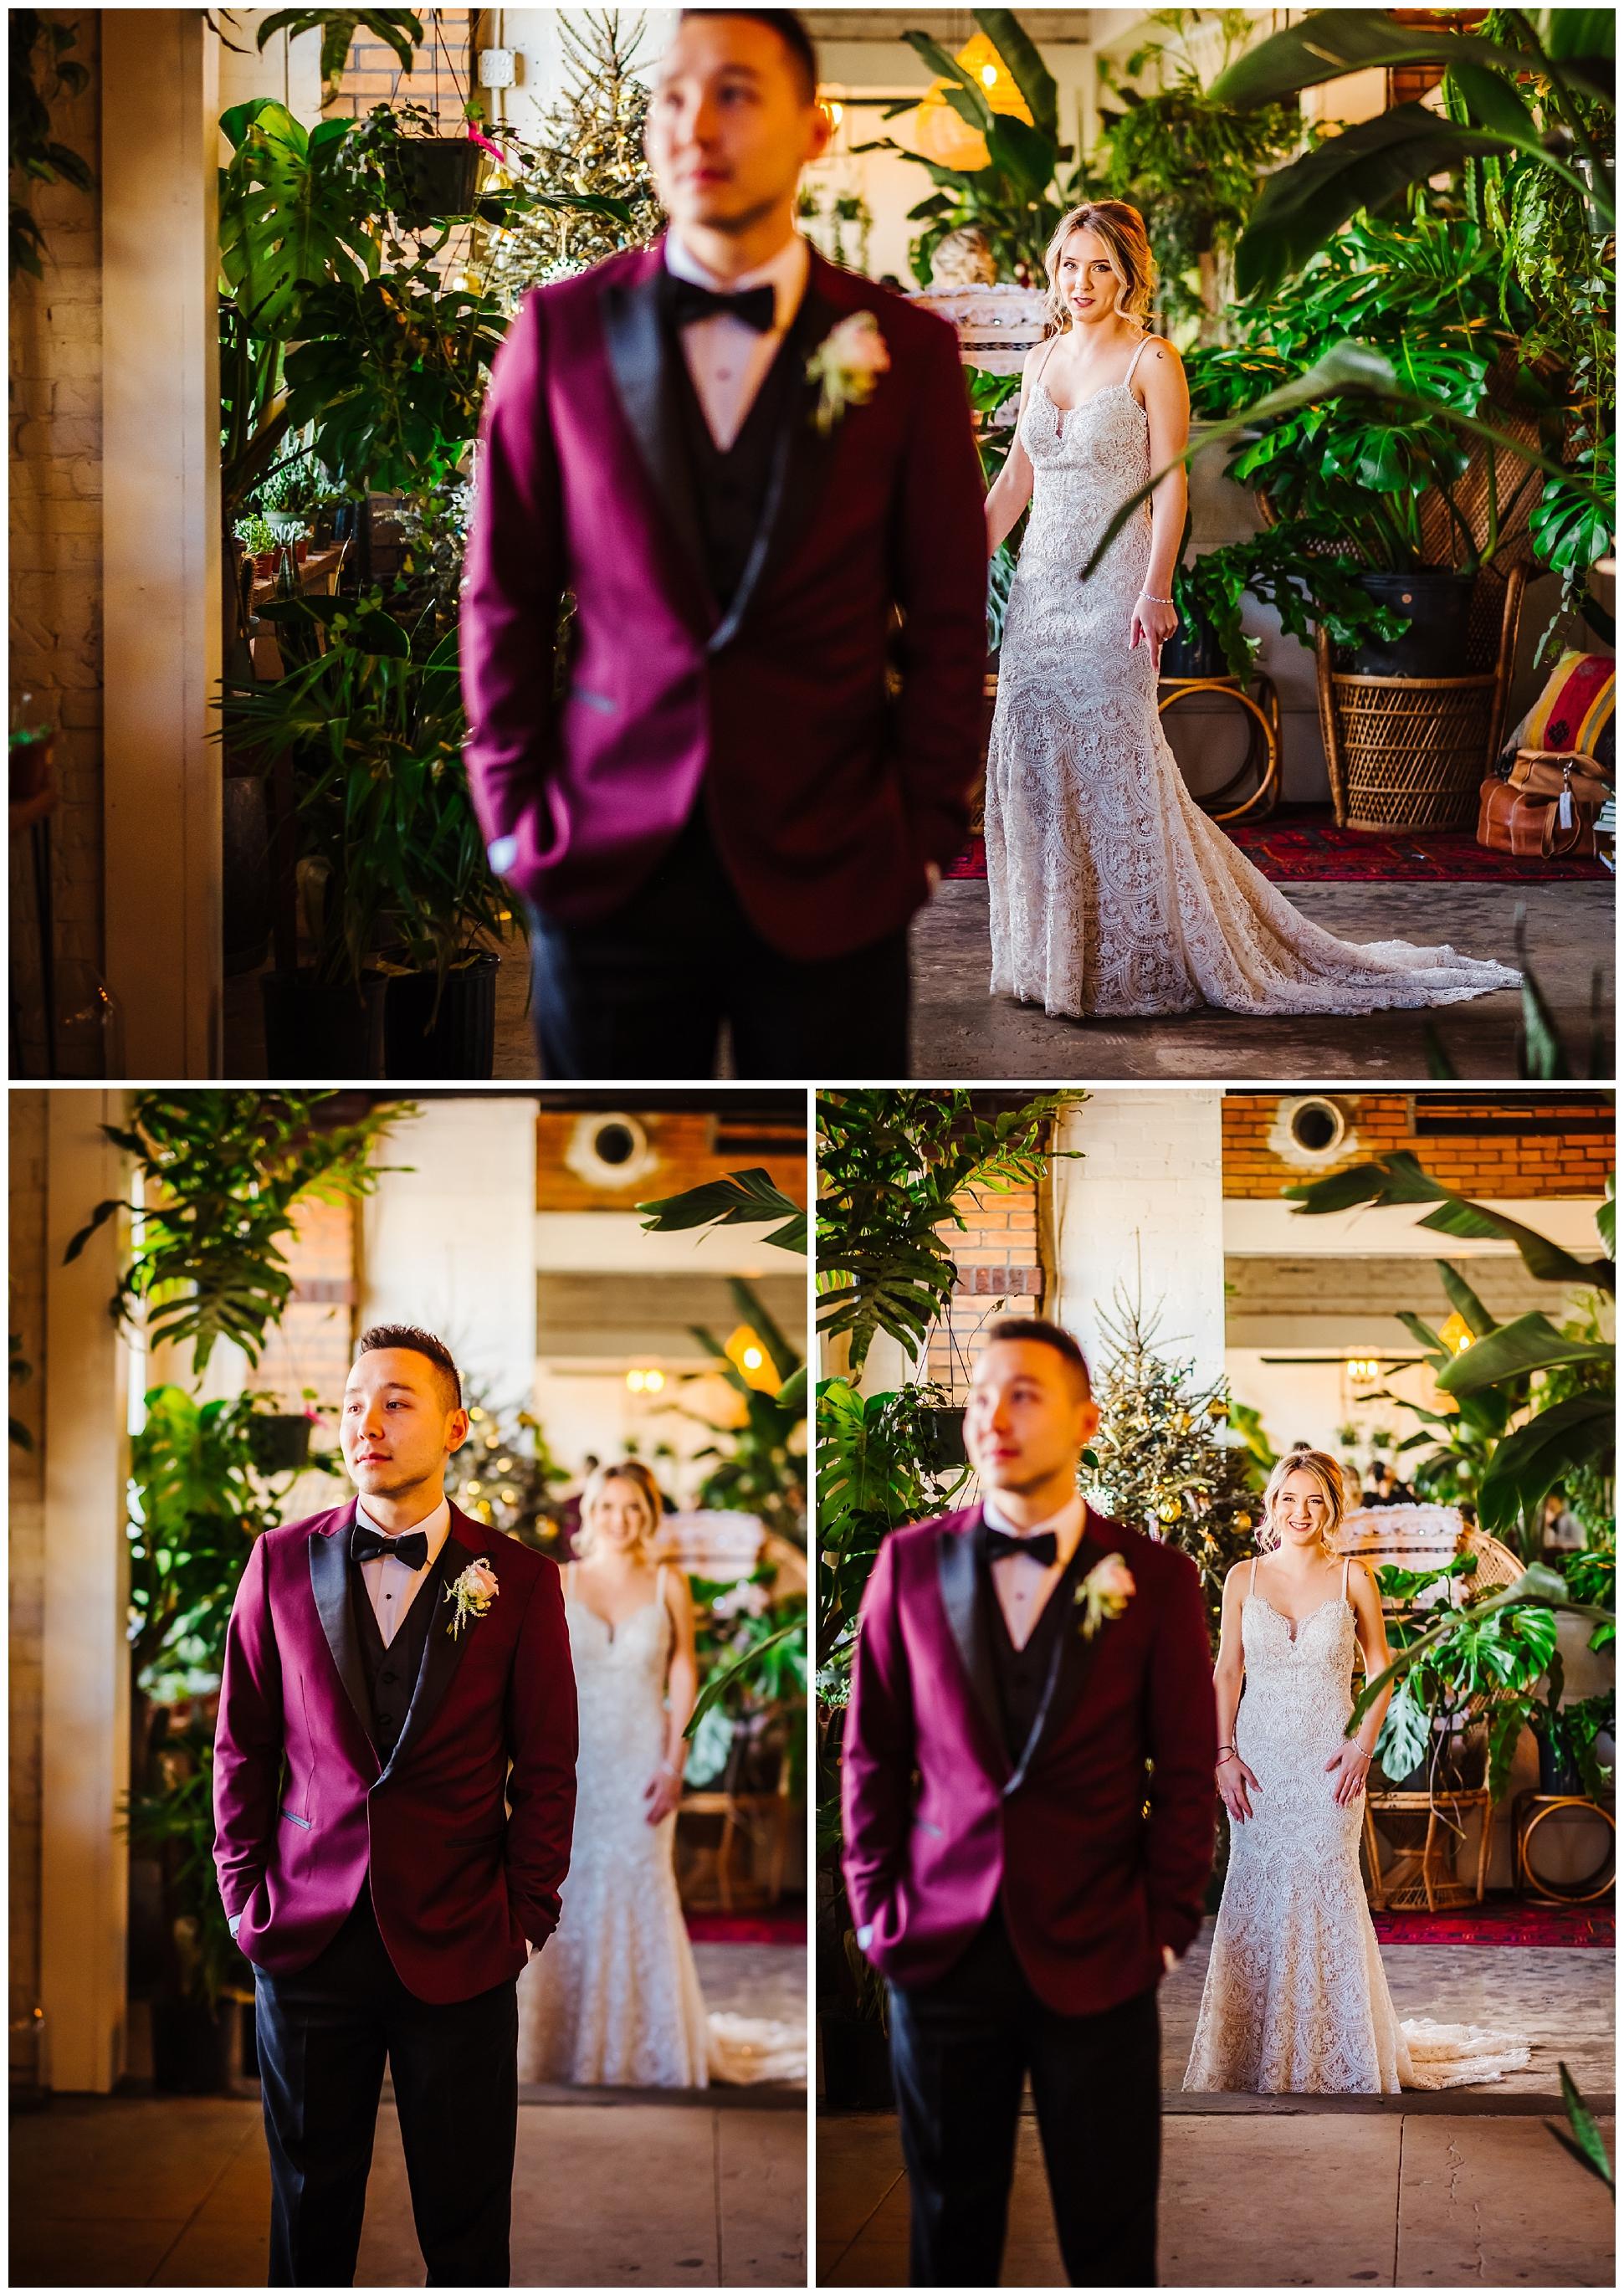 tampa-armeture-wedding-photographer-edgy-industrial-downtown-fancy-free-nursery-tattoo-burgandy-velvet_0020.jpg